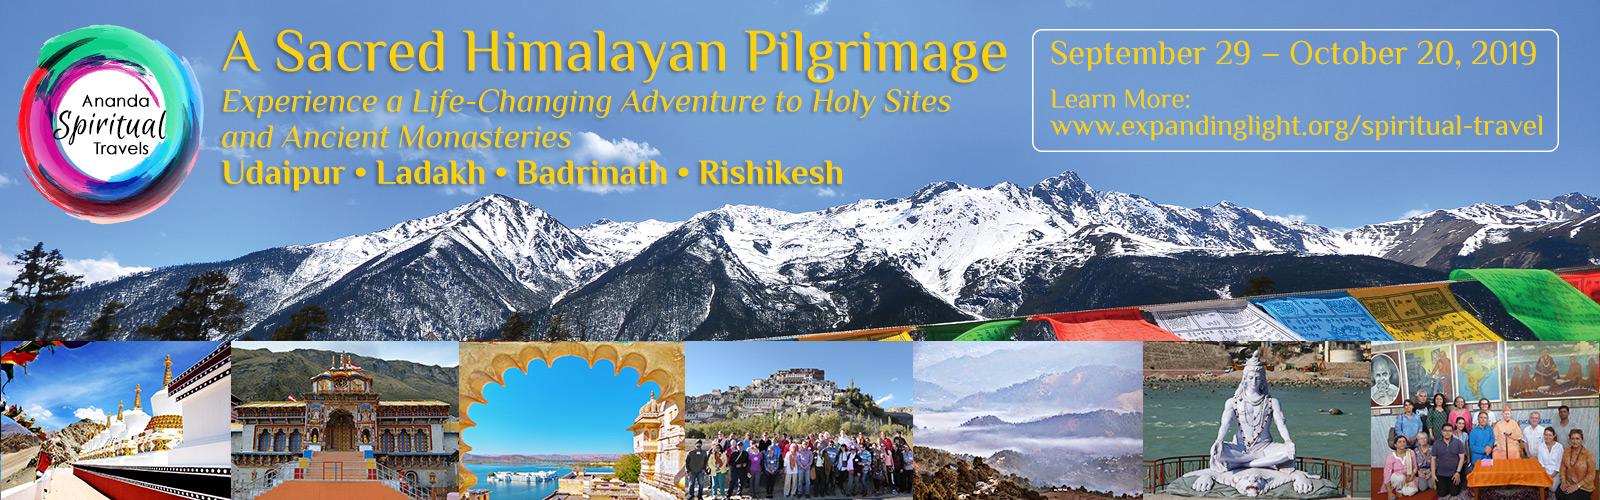 Sacred Himalayan Pilgrimage-Ananda